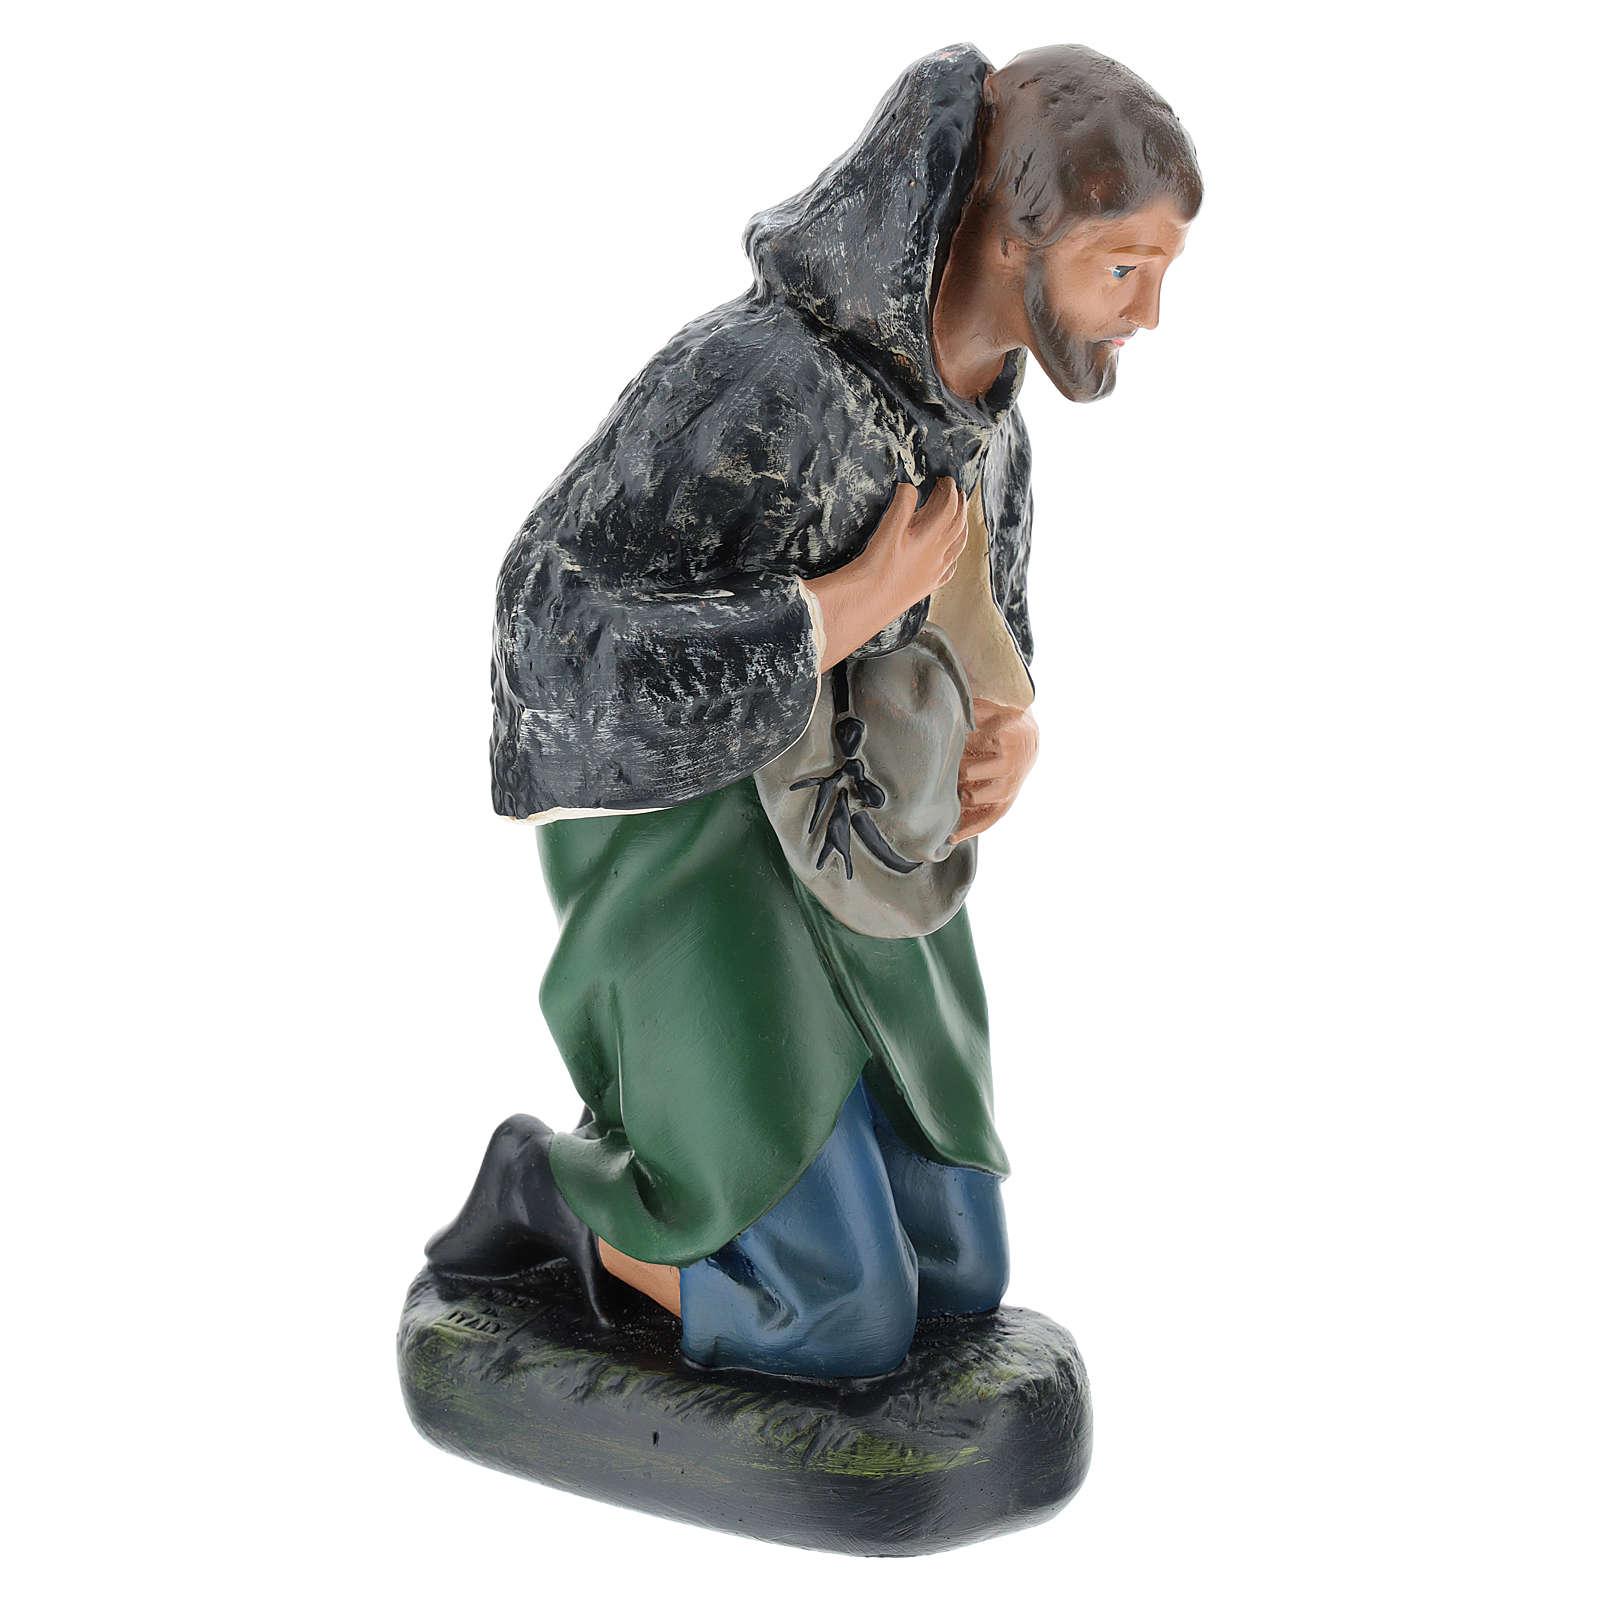 Estatua pastor con sombrero de rodillas belén Arte Barsanti 30 cm 4